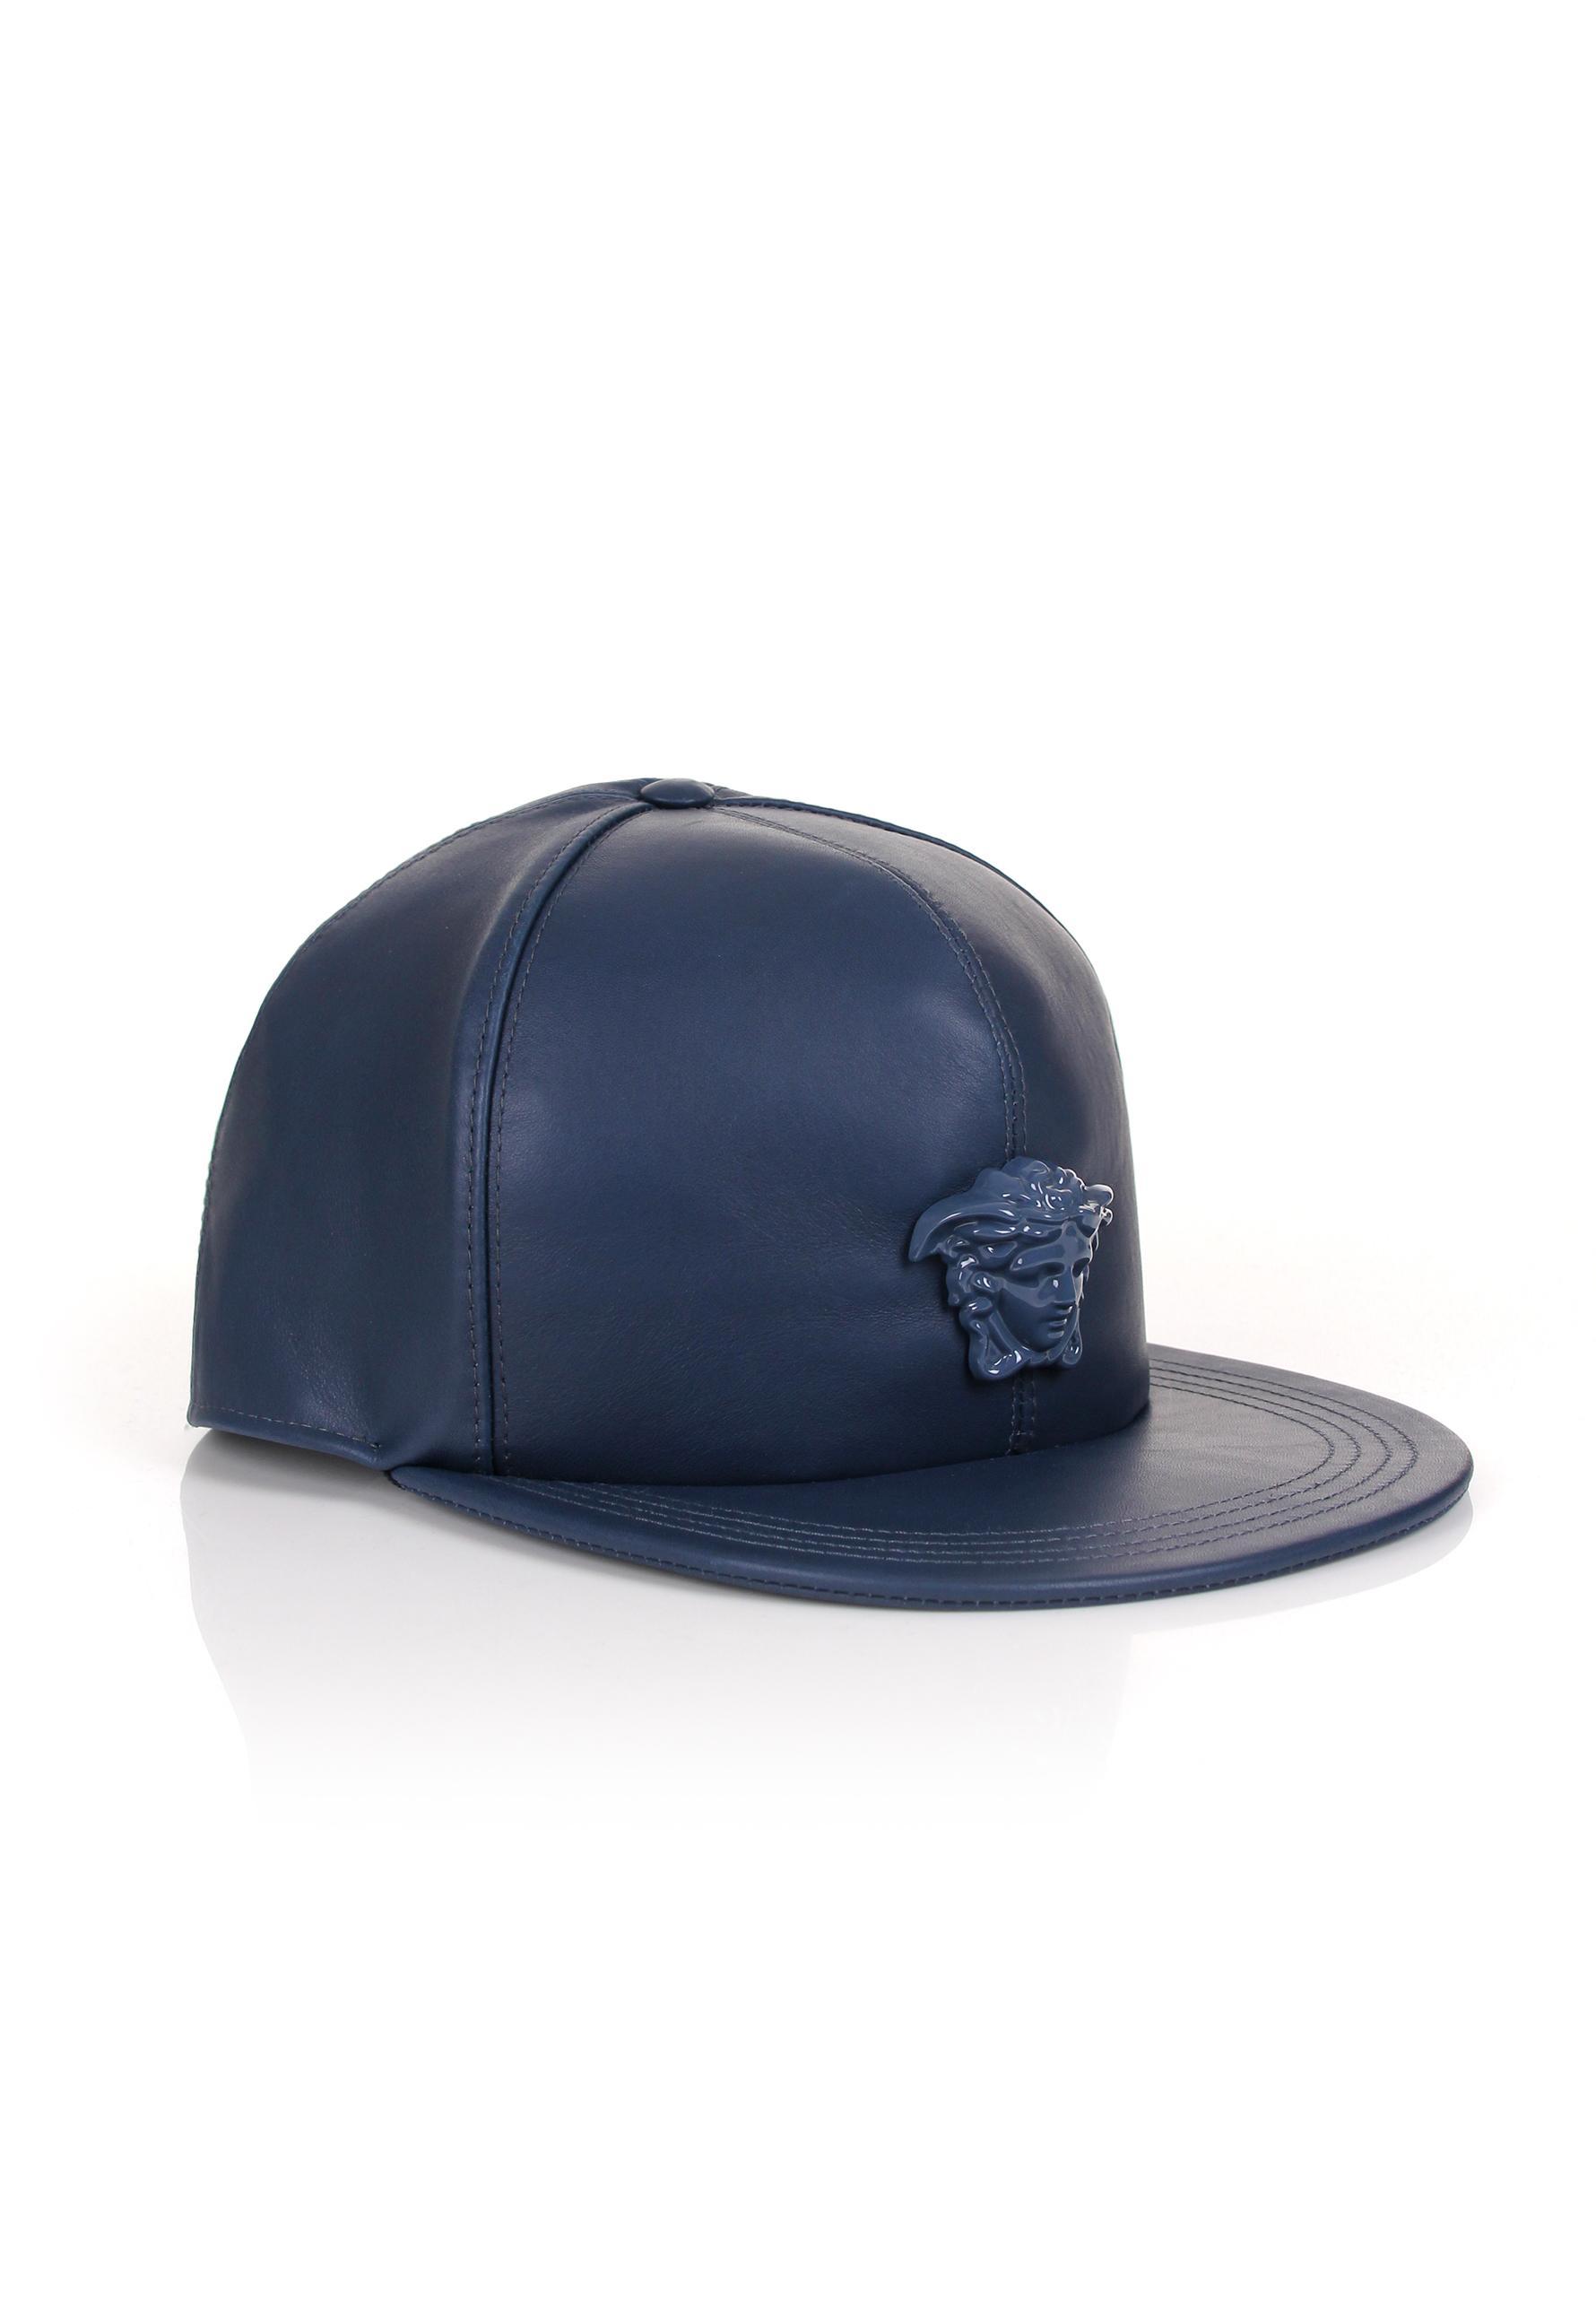 d15652e2a norway versace hats visor 18005 b7ba2